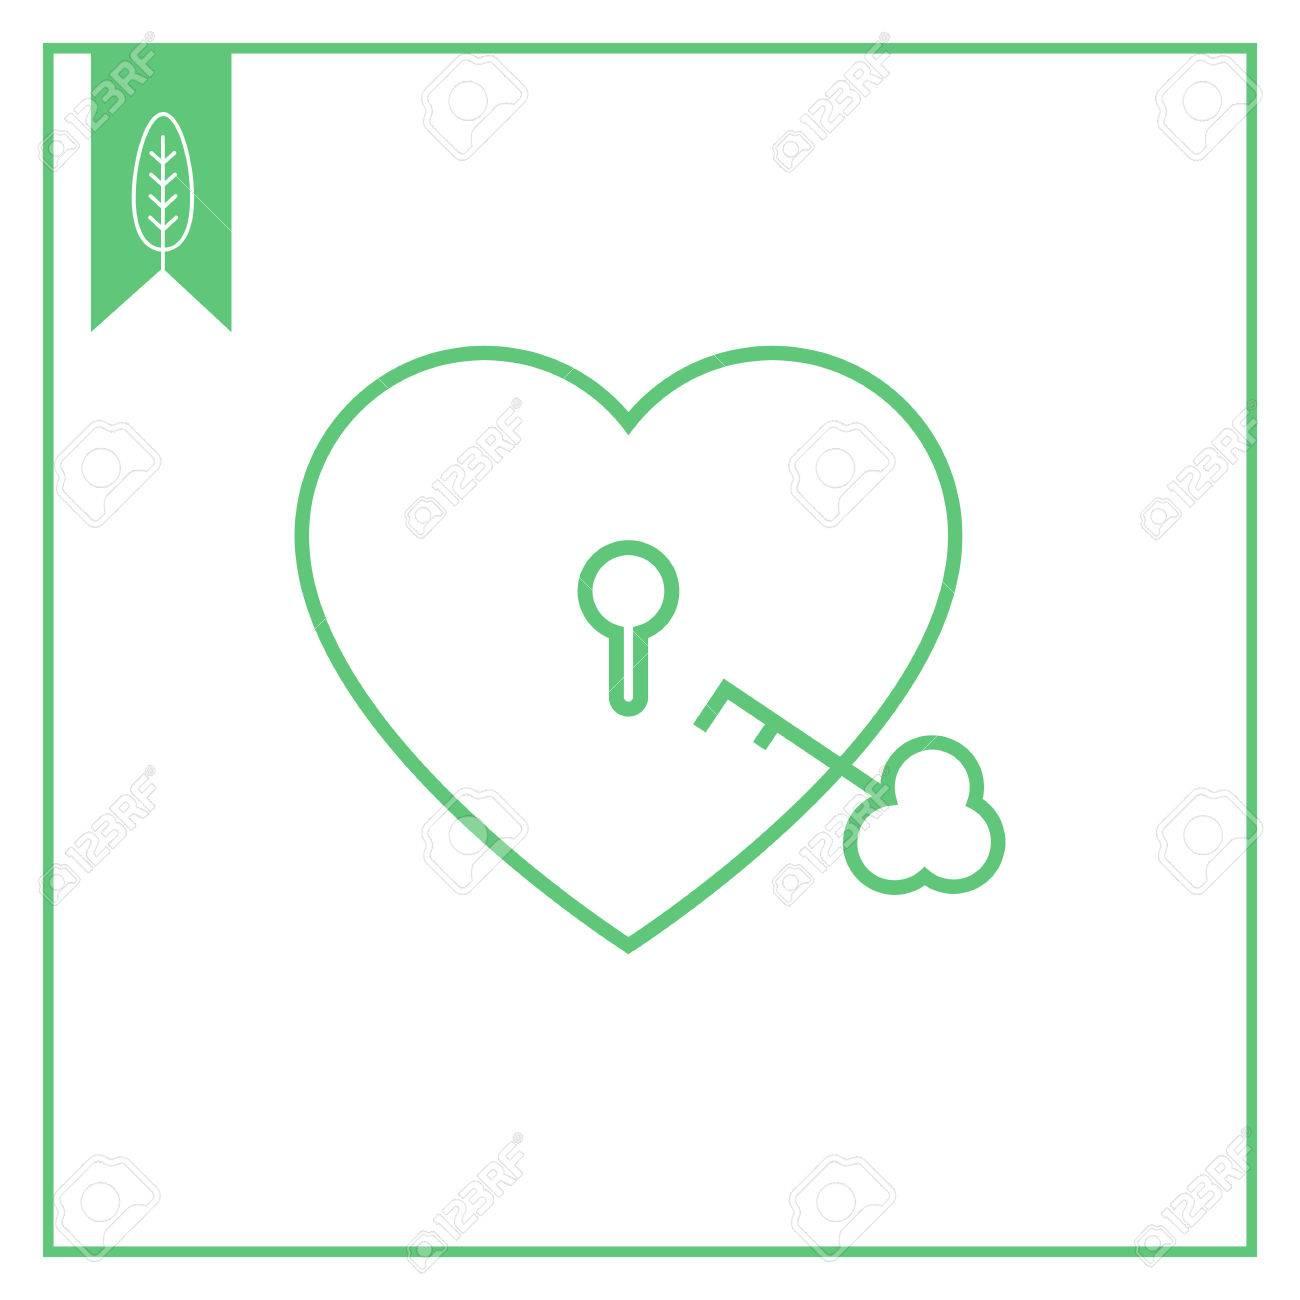 Icon Of Heart Shaped Padlock With Key Royalty Free Cliparts Vectors